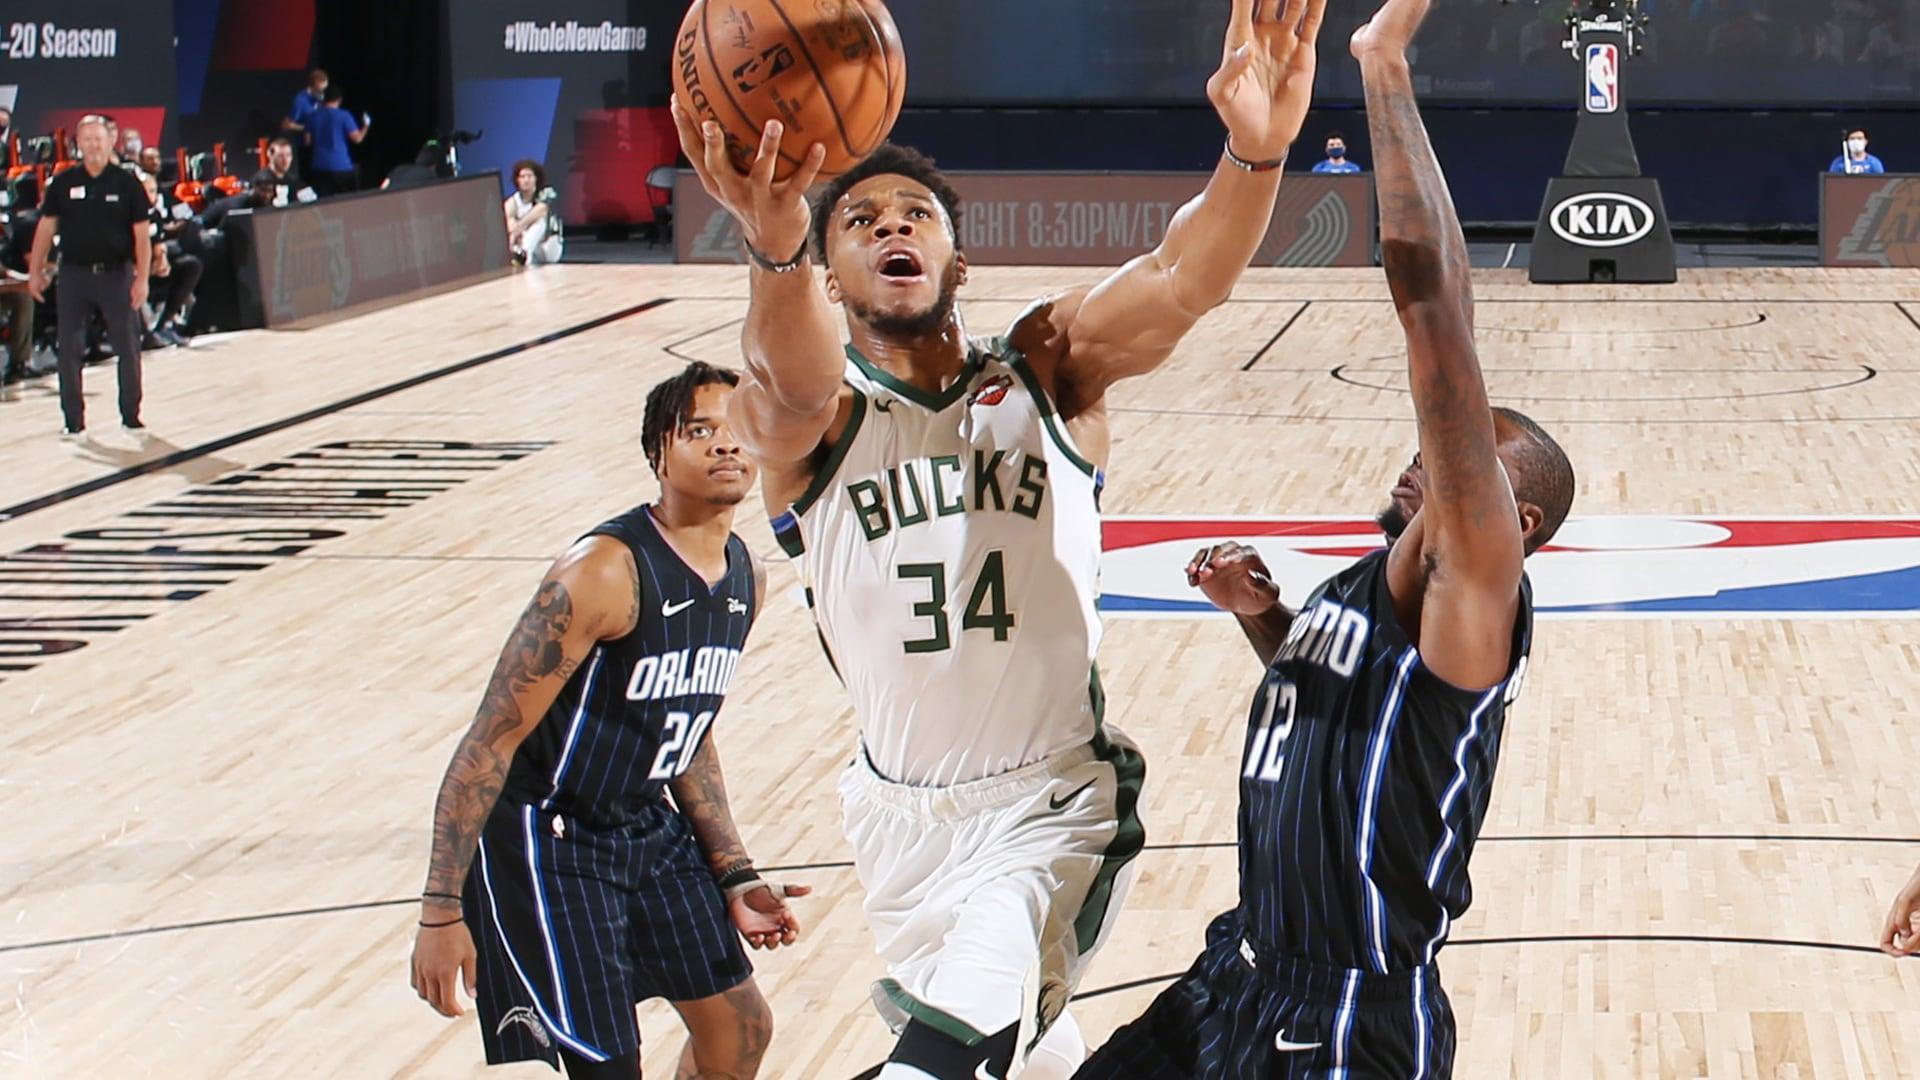 Bucks @ Magic